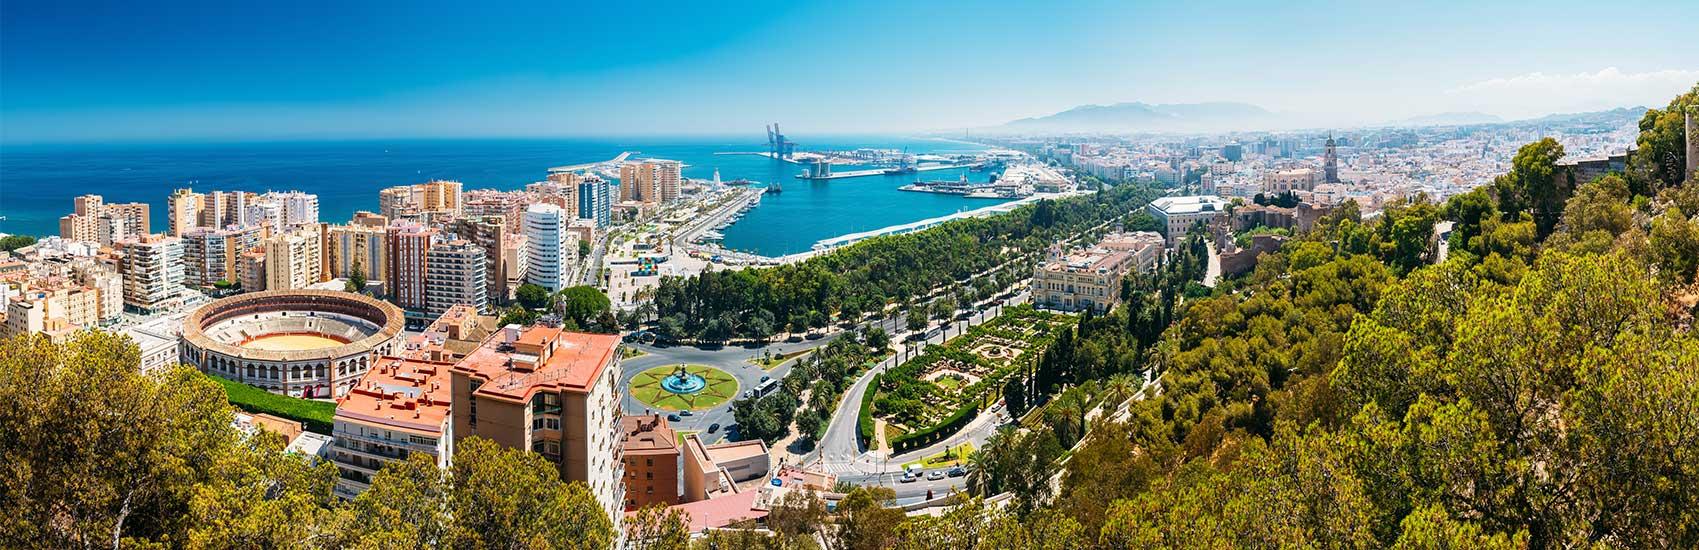 Alluring Rivieras